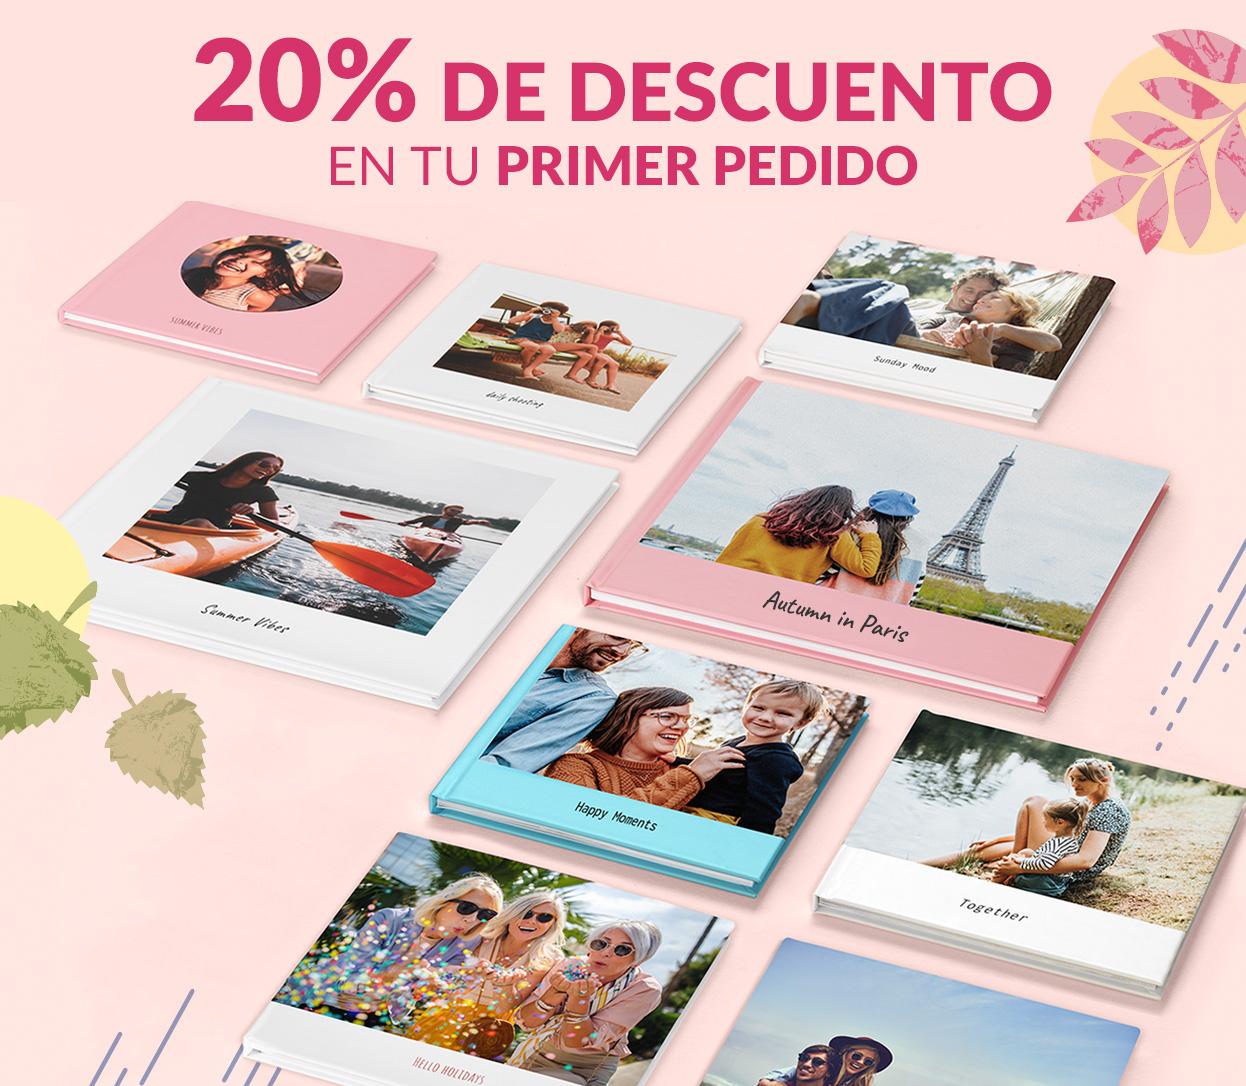 promo image